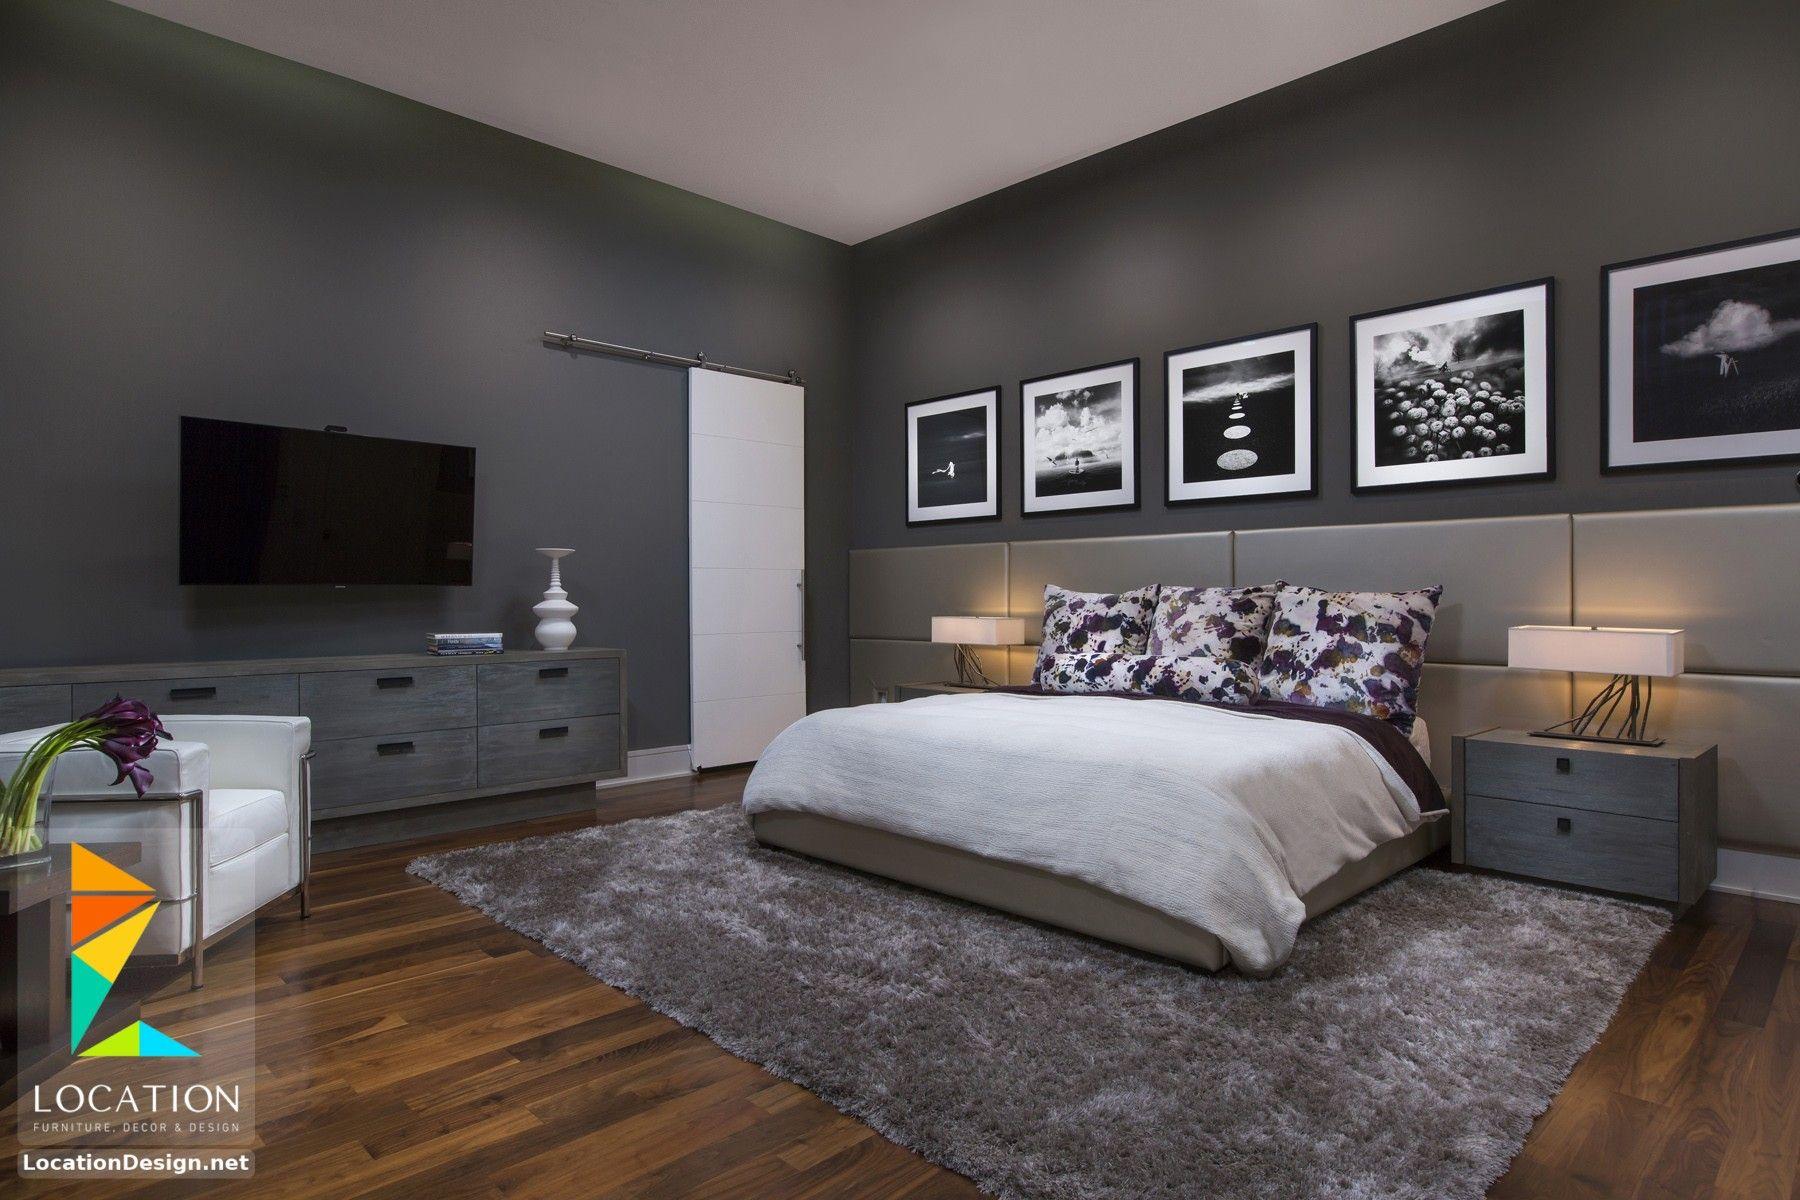 الوان دهانات غرف نوم رومانسيه 133 Kid Room Creative Ideas 2019 غر Kids Bedroom Designs Bedroom Decor Home Decor Bedroom